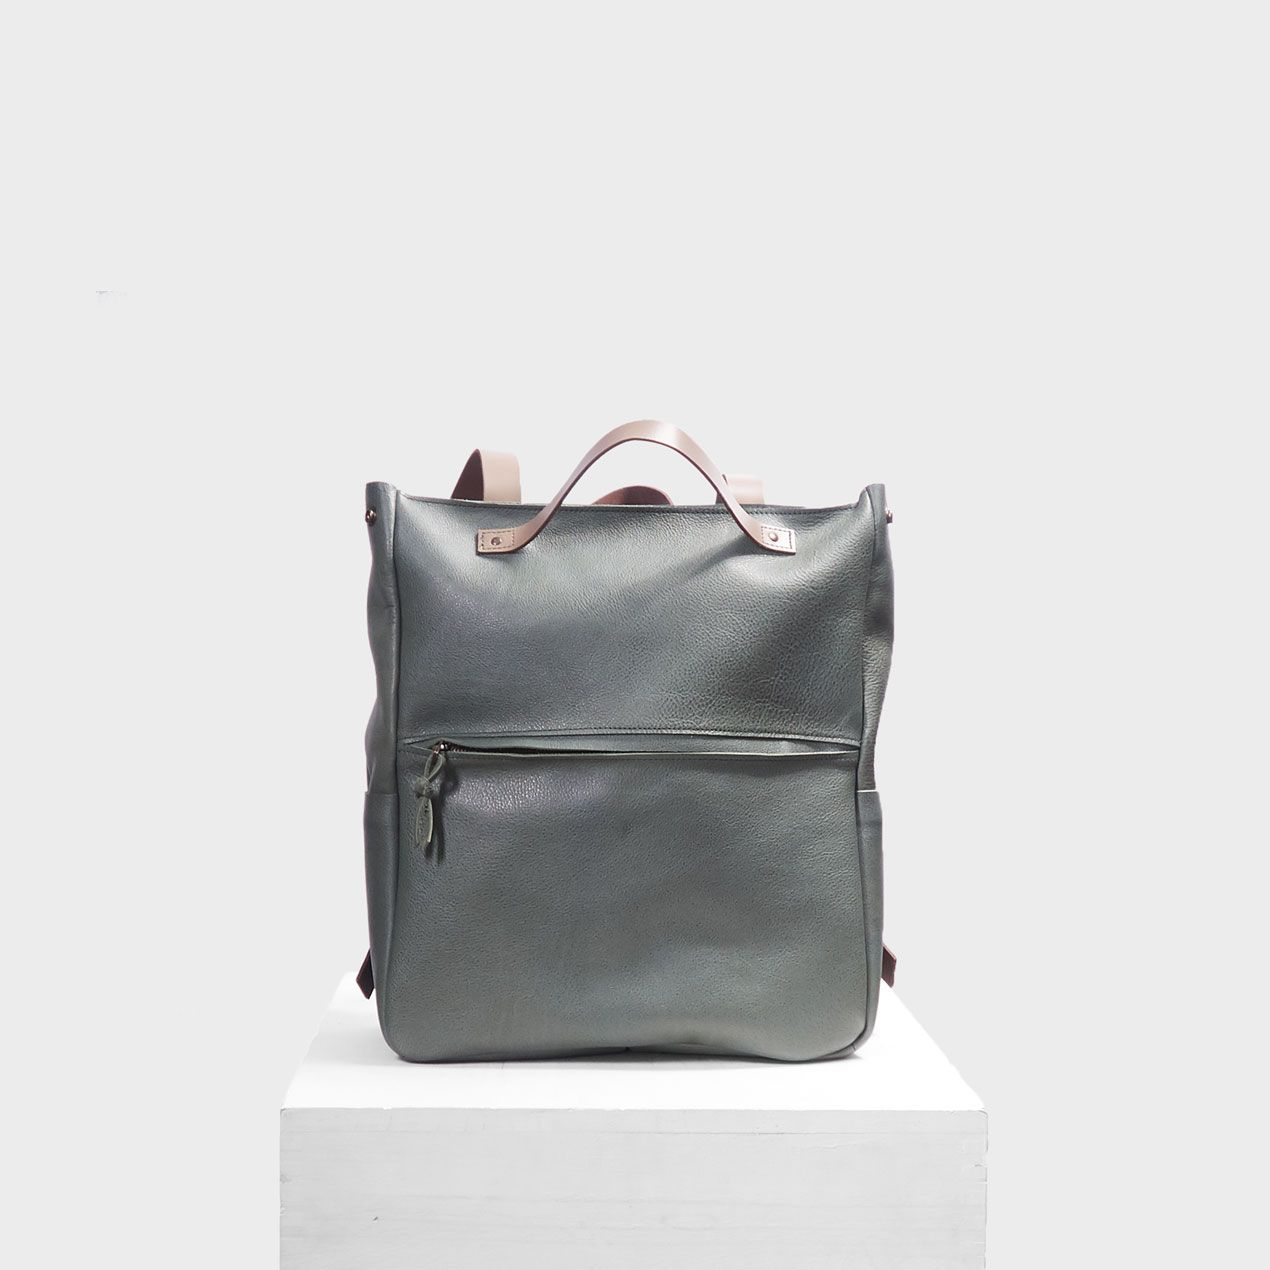 Handbag • Sak 10 small • Black